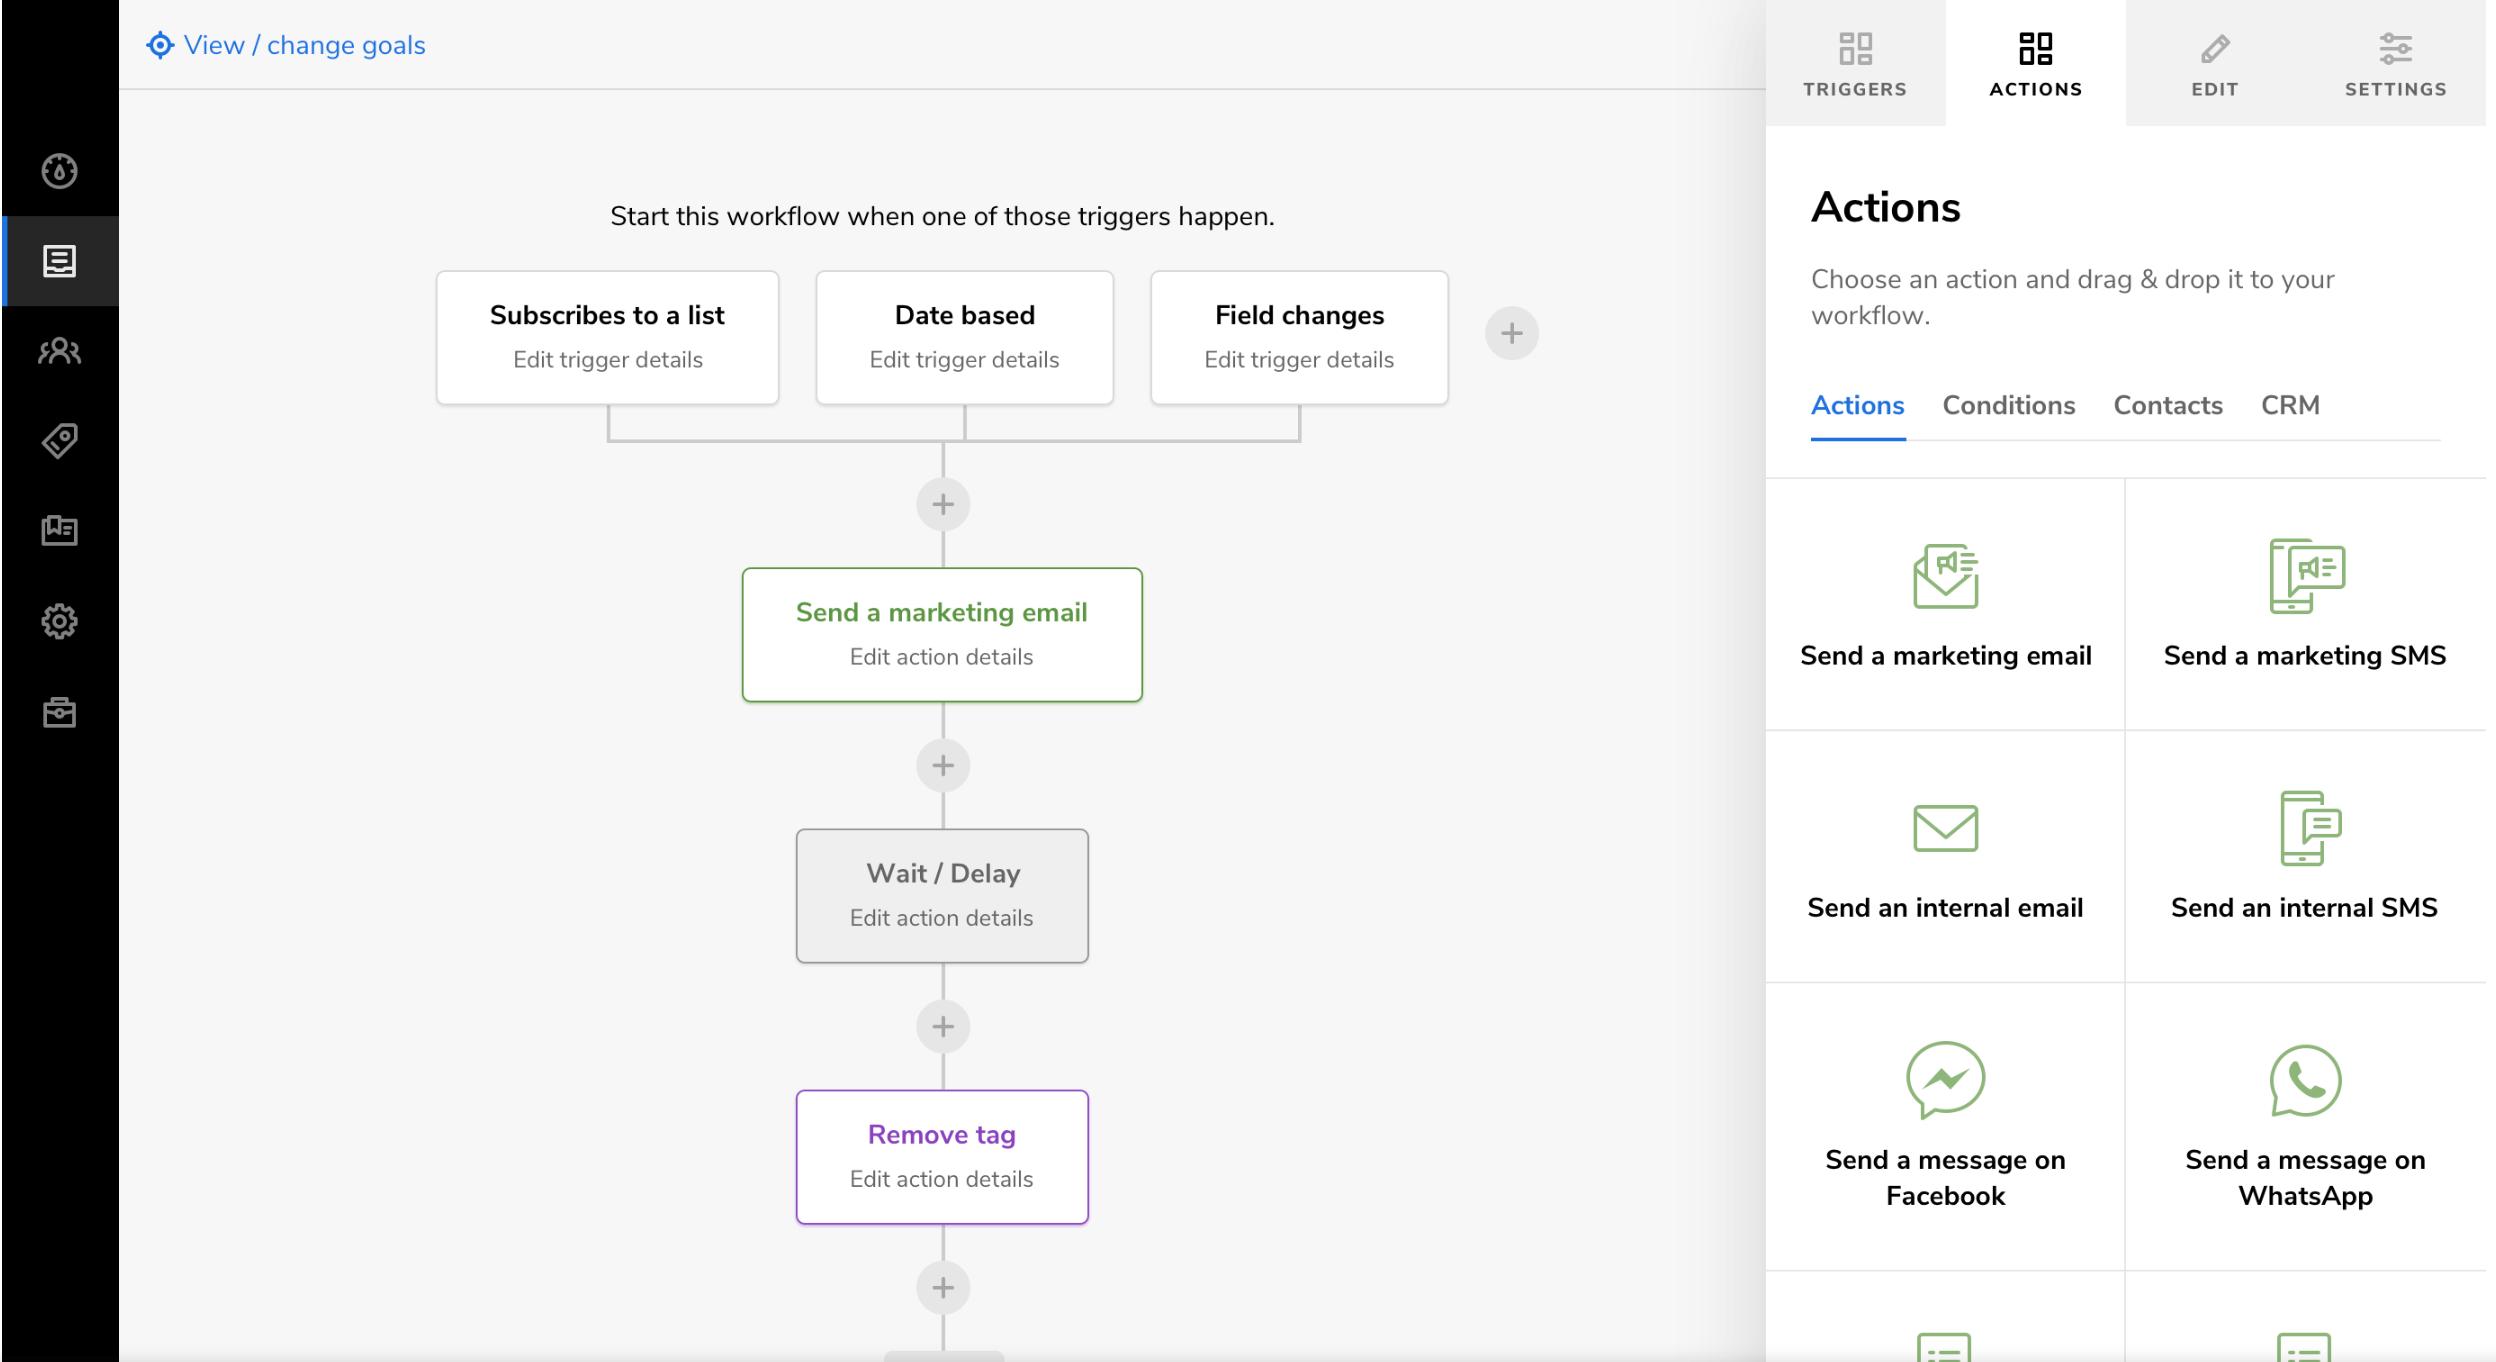 Workflow Tool